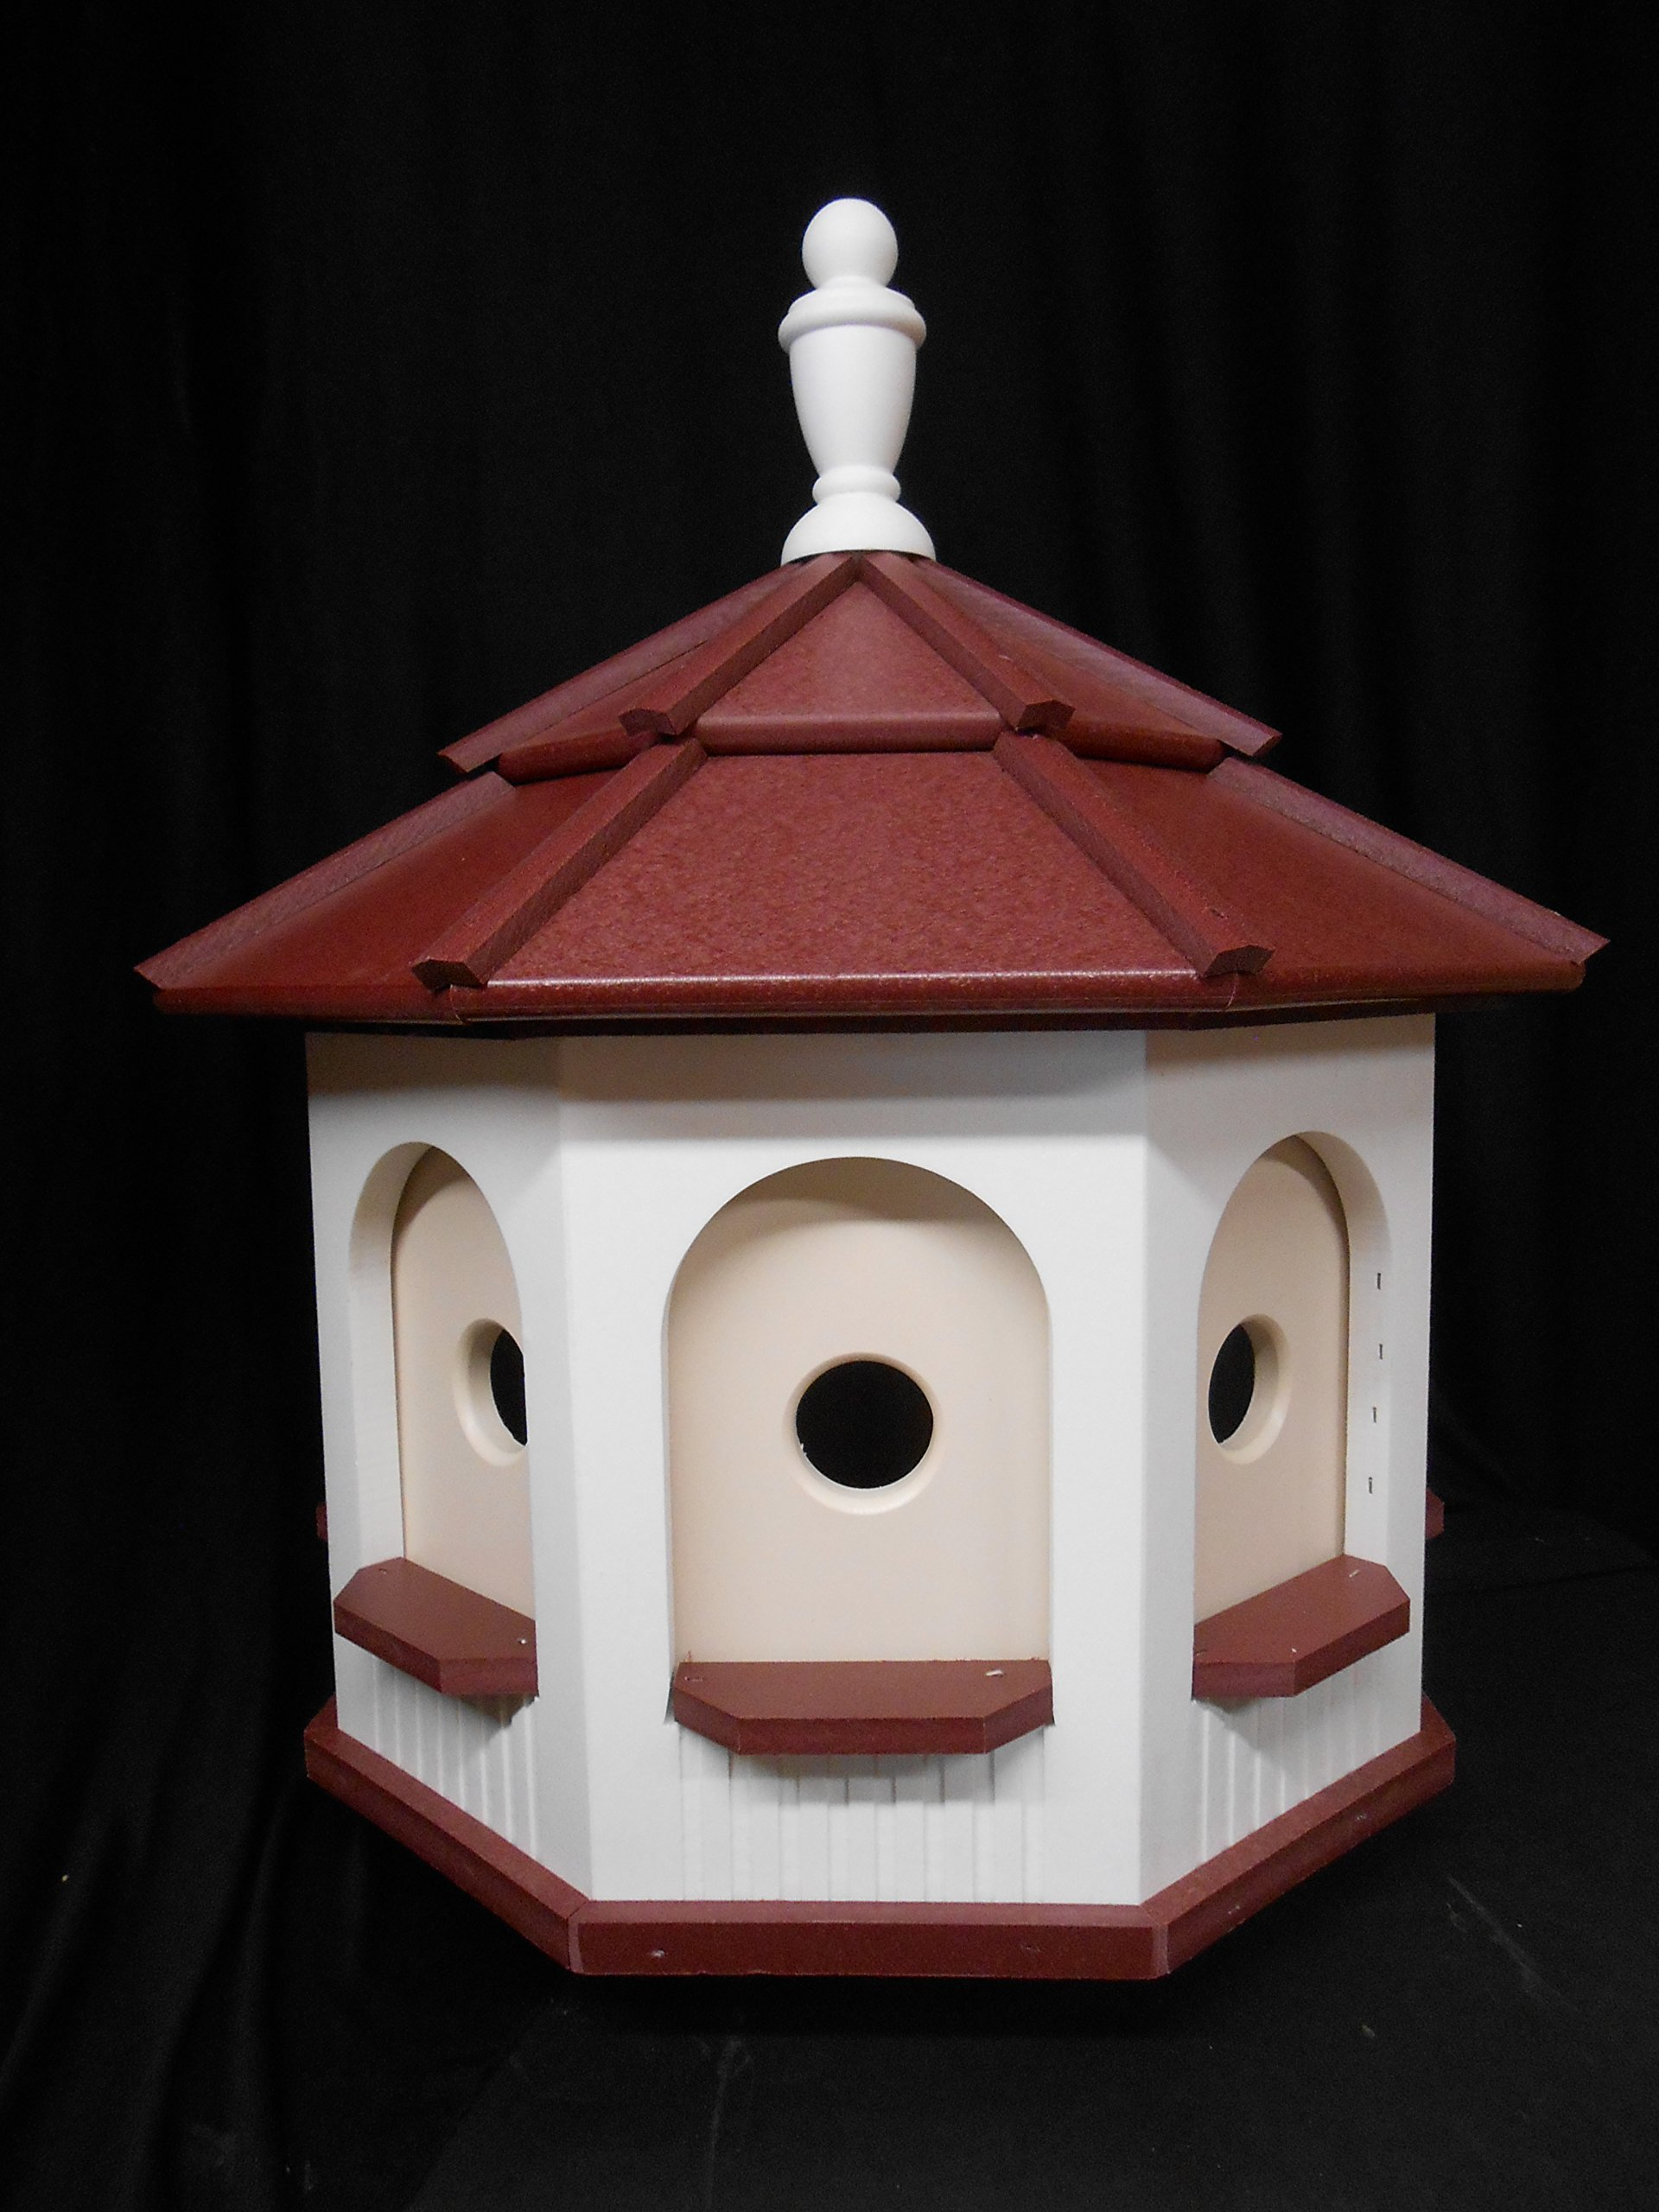 Amish homemade handcrafted Handmade Poly Gazebo Birdhouse yard White & Red Large